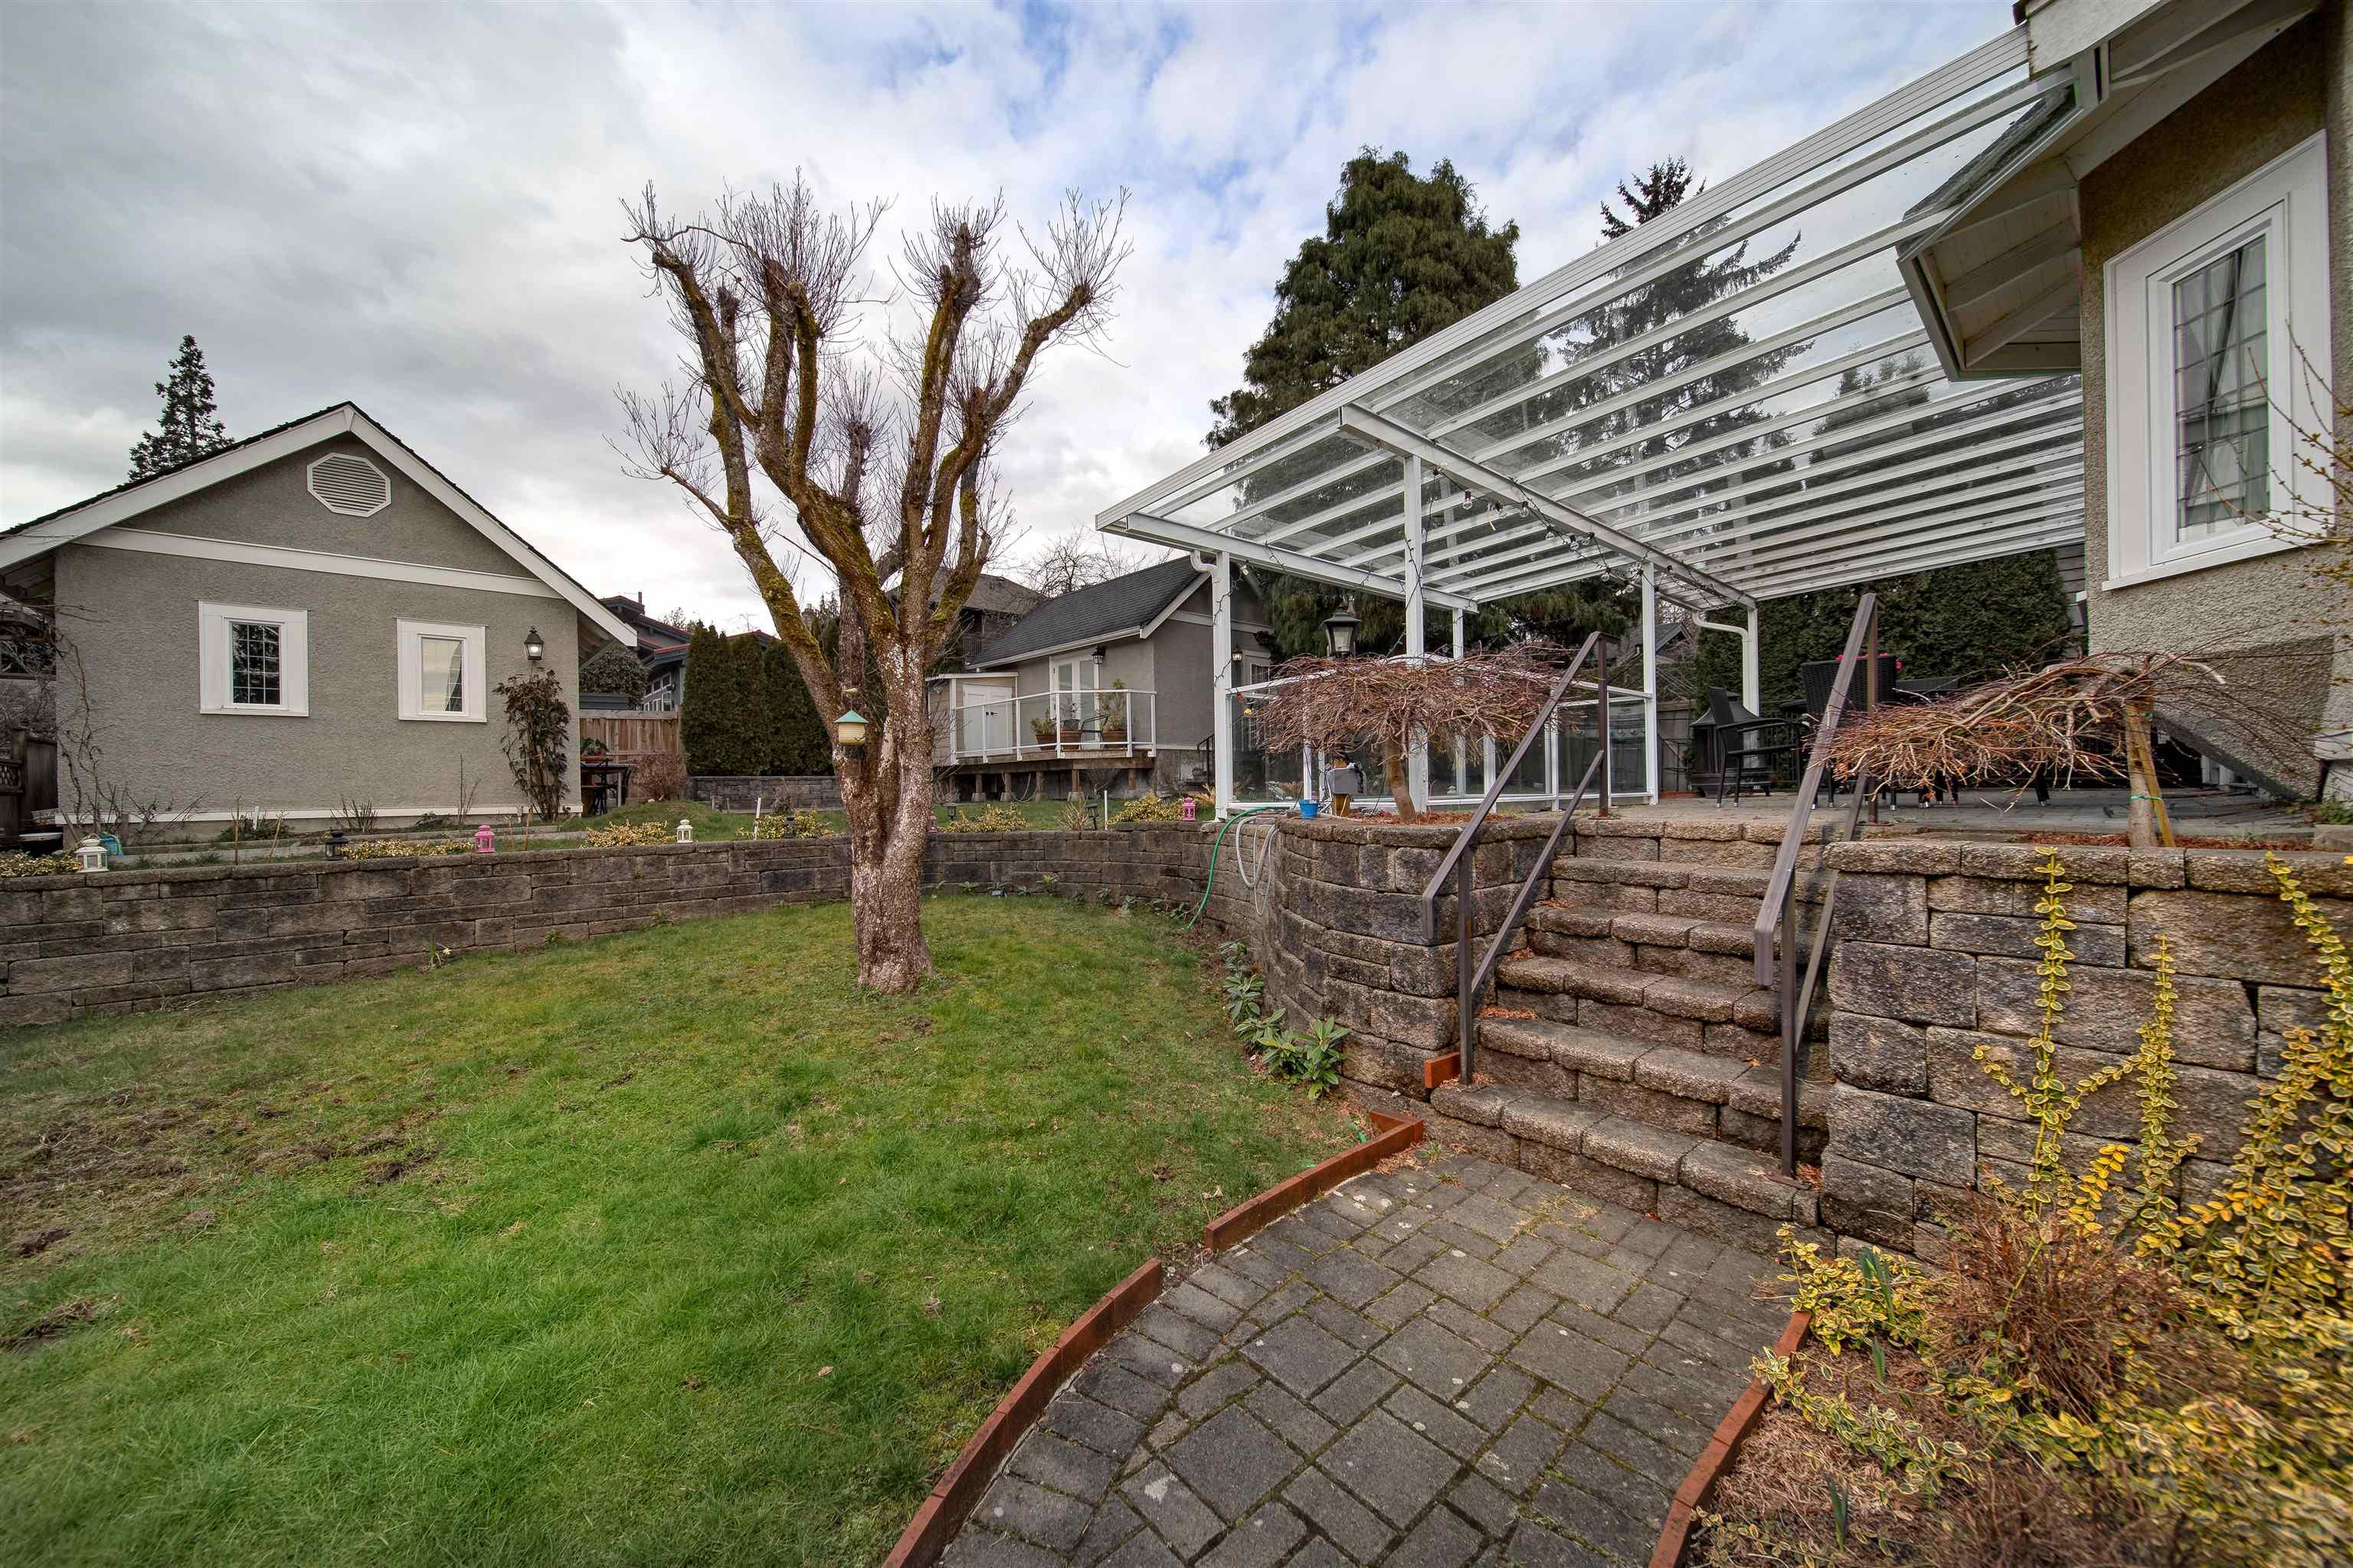 1357 FULTON AVENUE - Ambleside House/Single Family for sale, 6 Bedrooms (R2617731) - #6